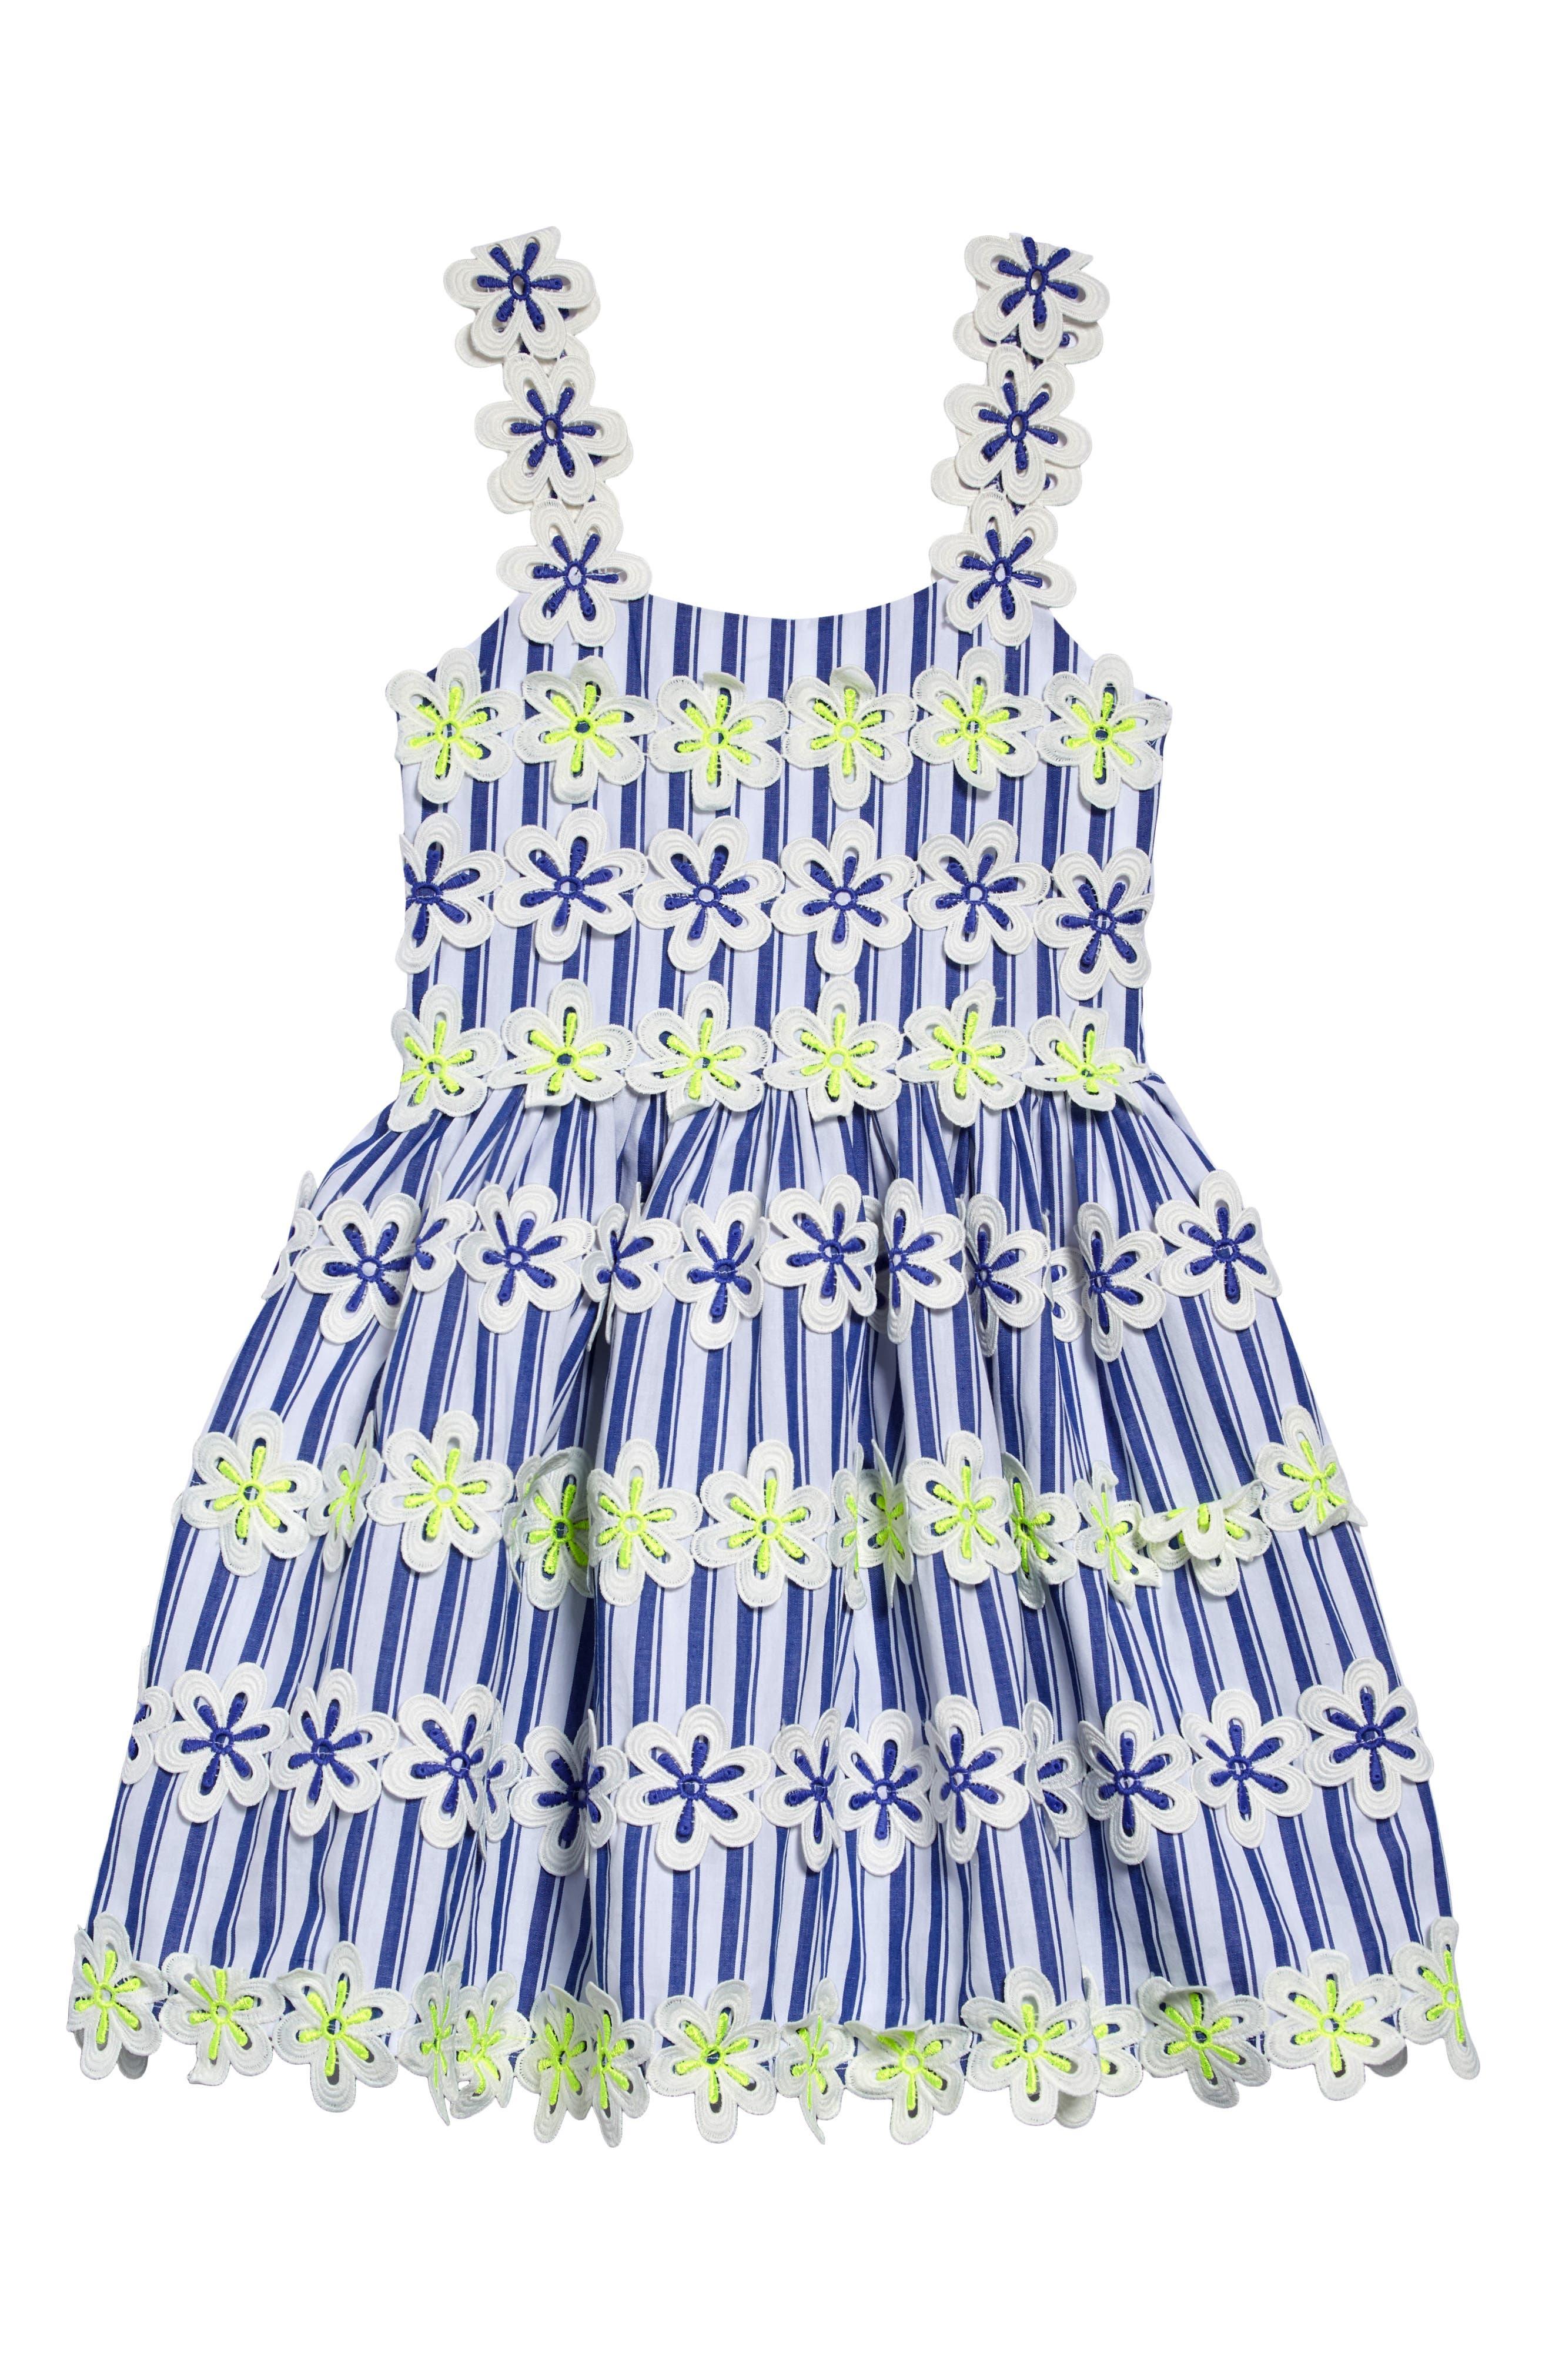 Girls Halabaloo Stripe  Floral Embroidered Fit  Flare Dress Size 4  Blue